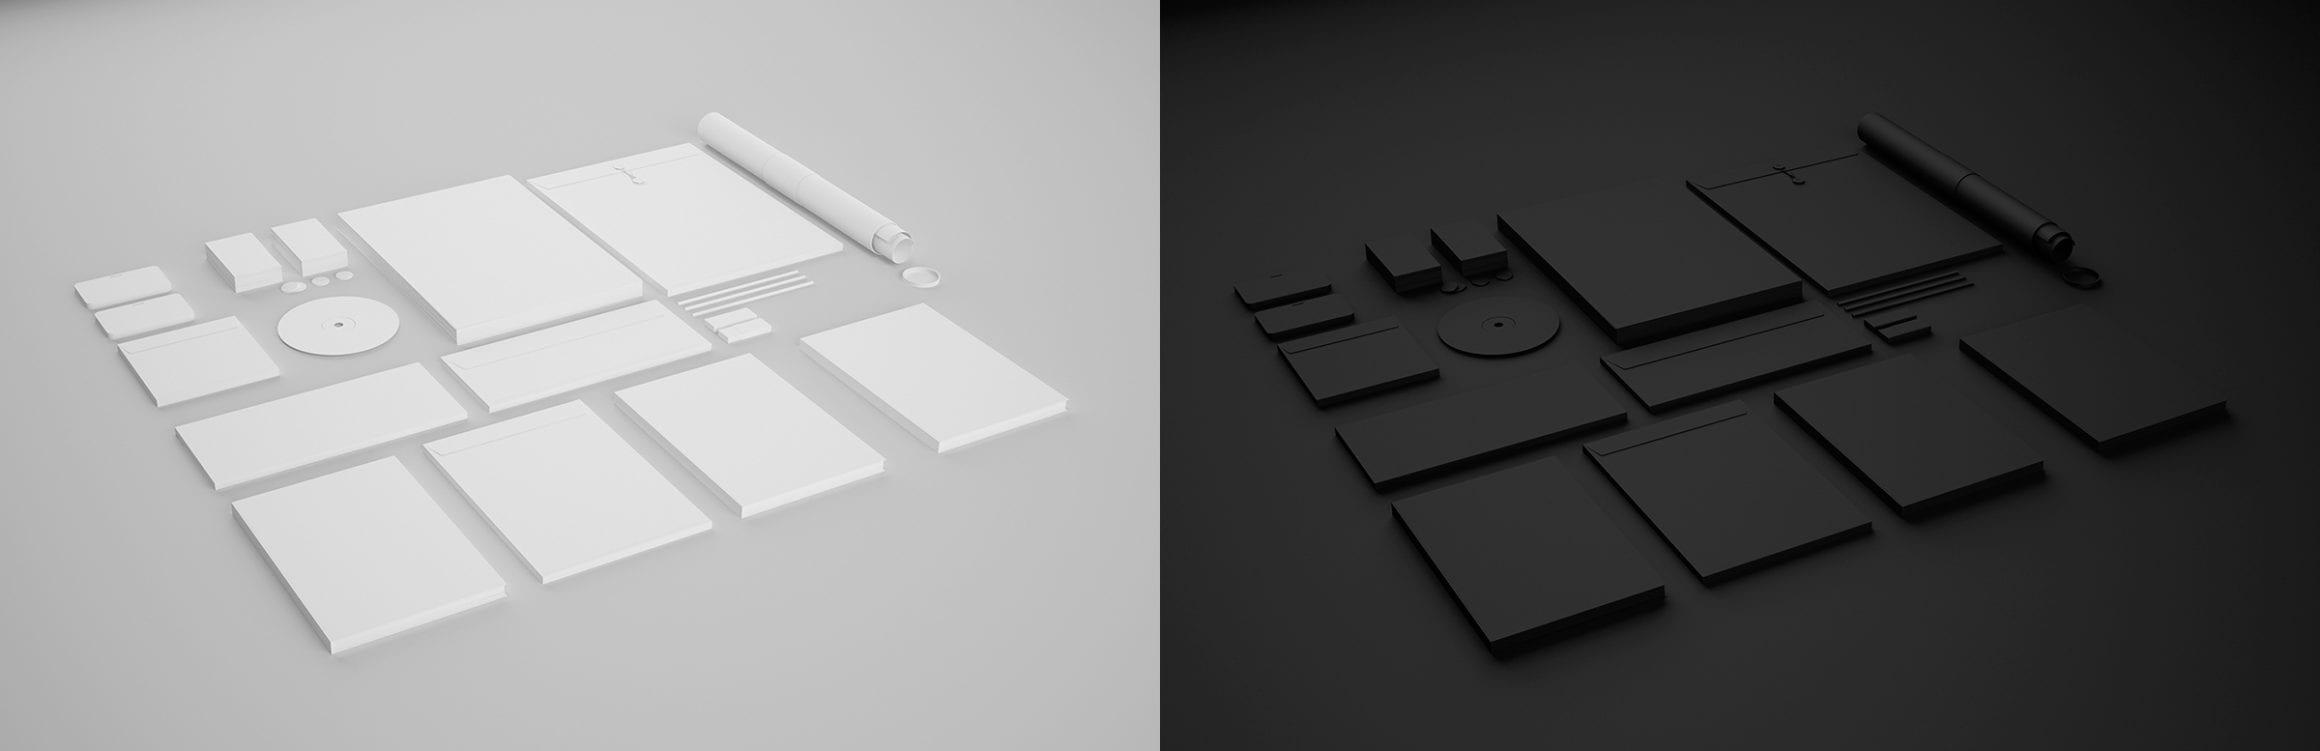 e710824f4c1f021334c0186bd90462d6 - Ebony & Ivory branding mockup zadarmo